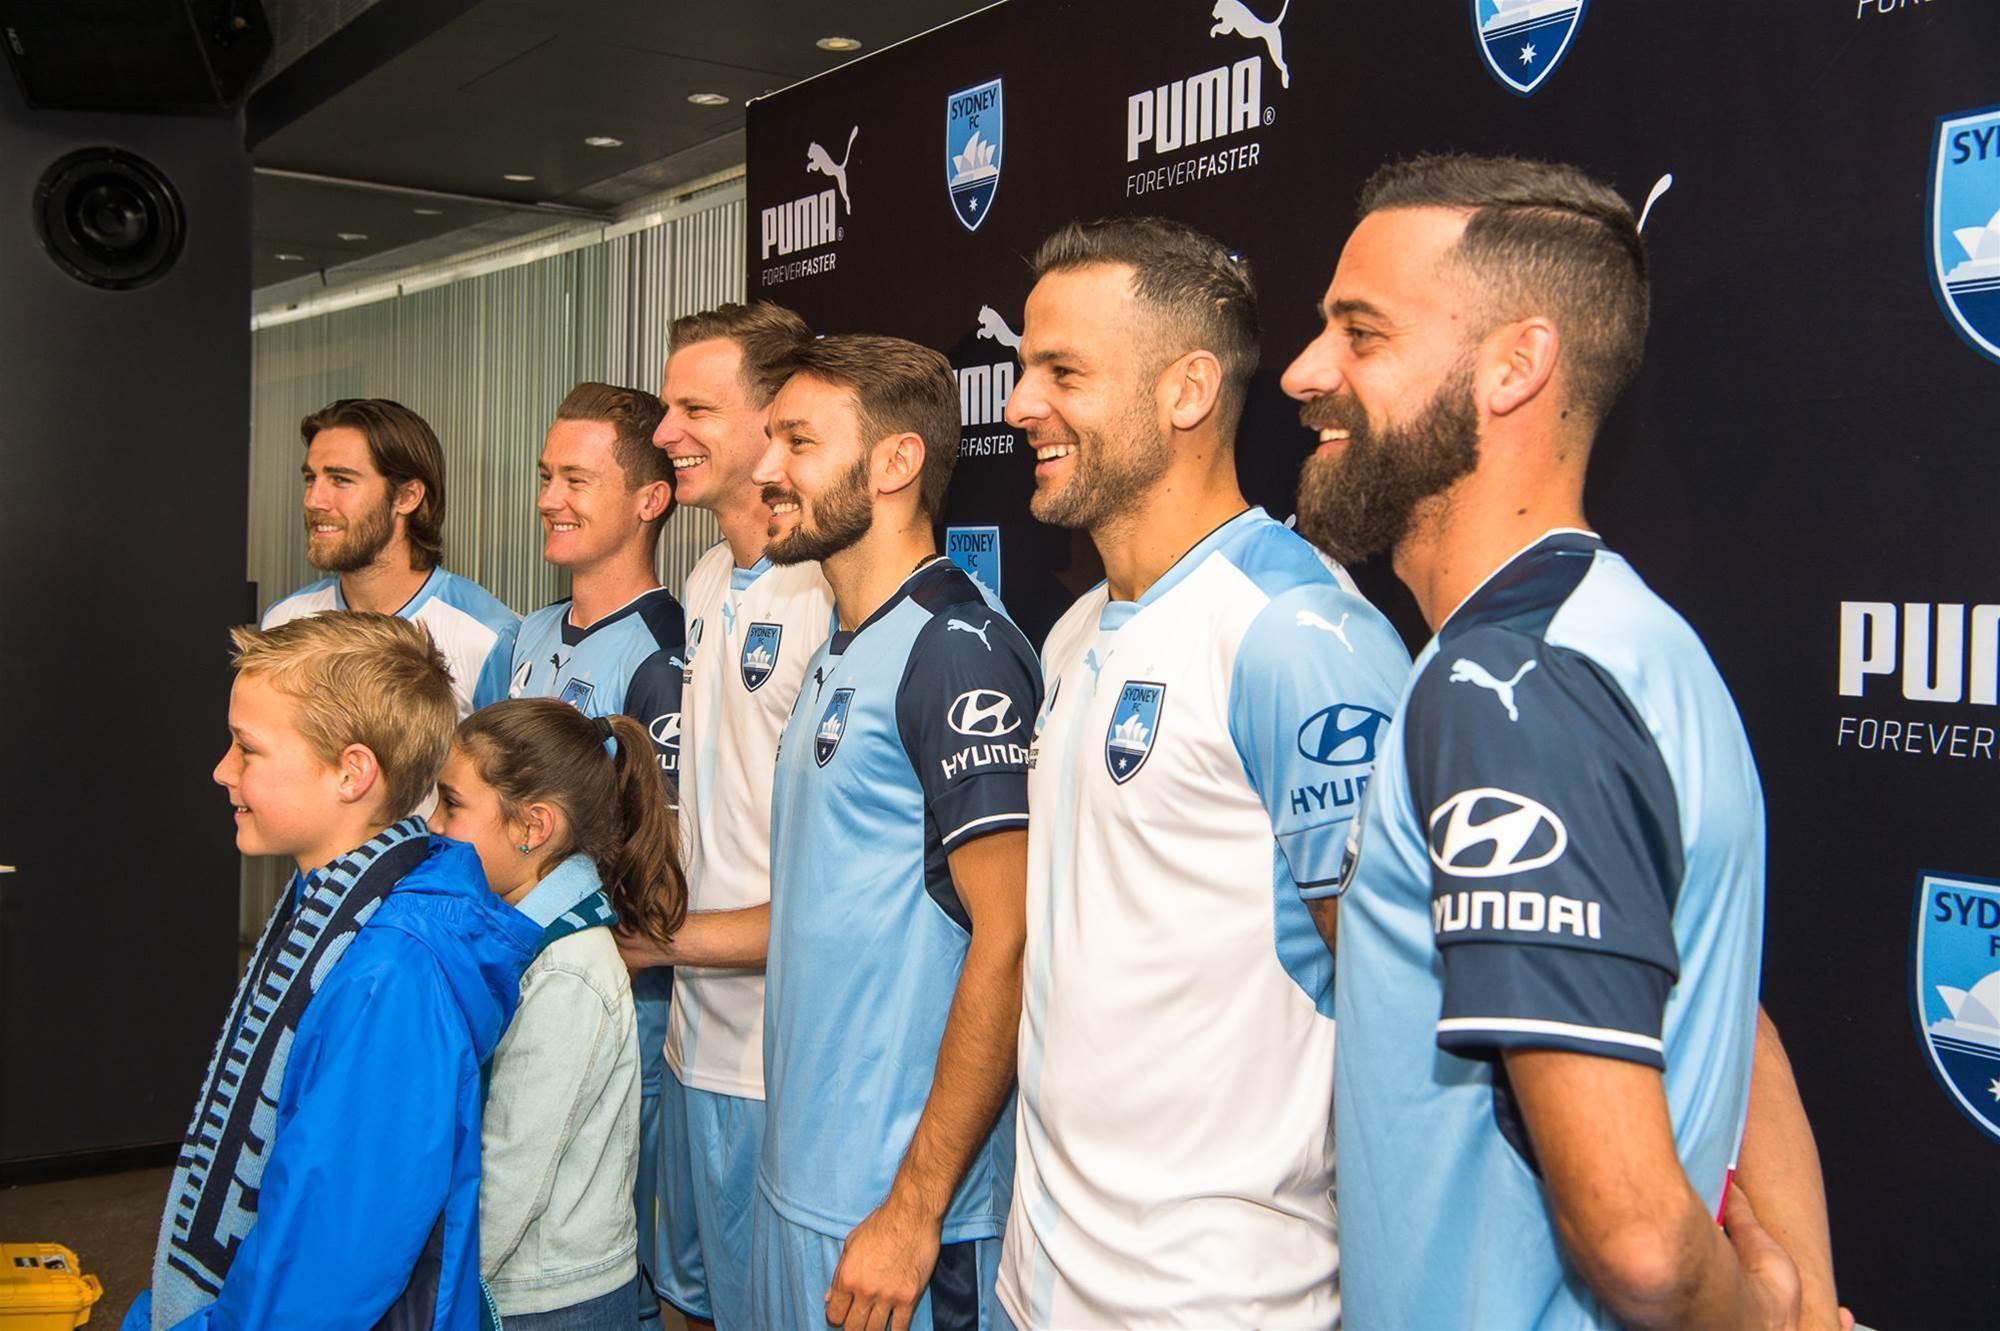 Sydney FC unveils new kit